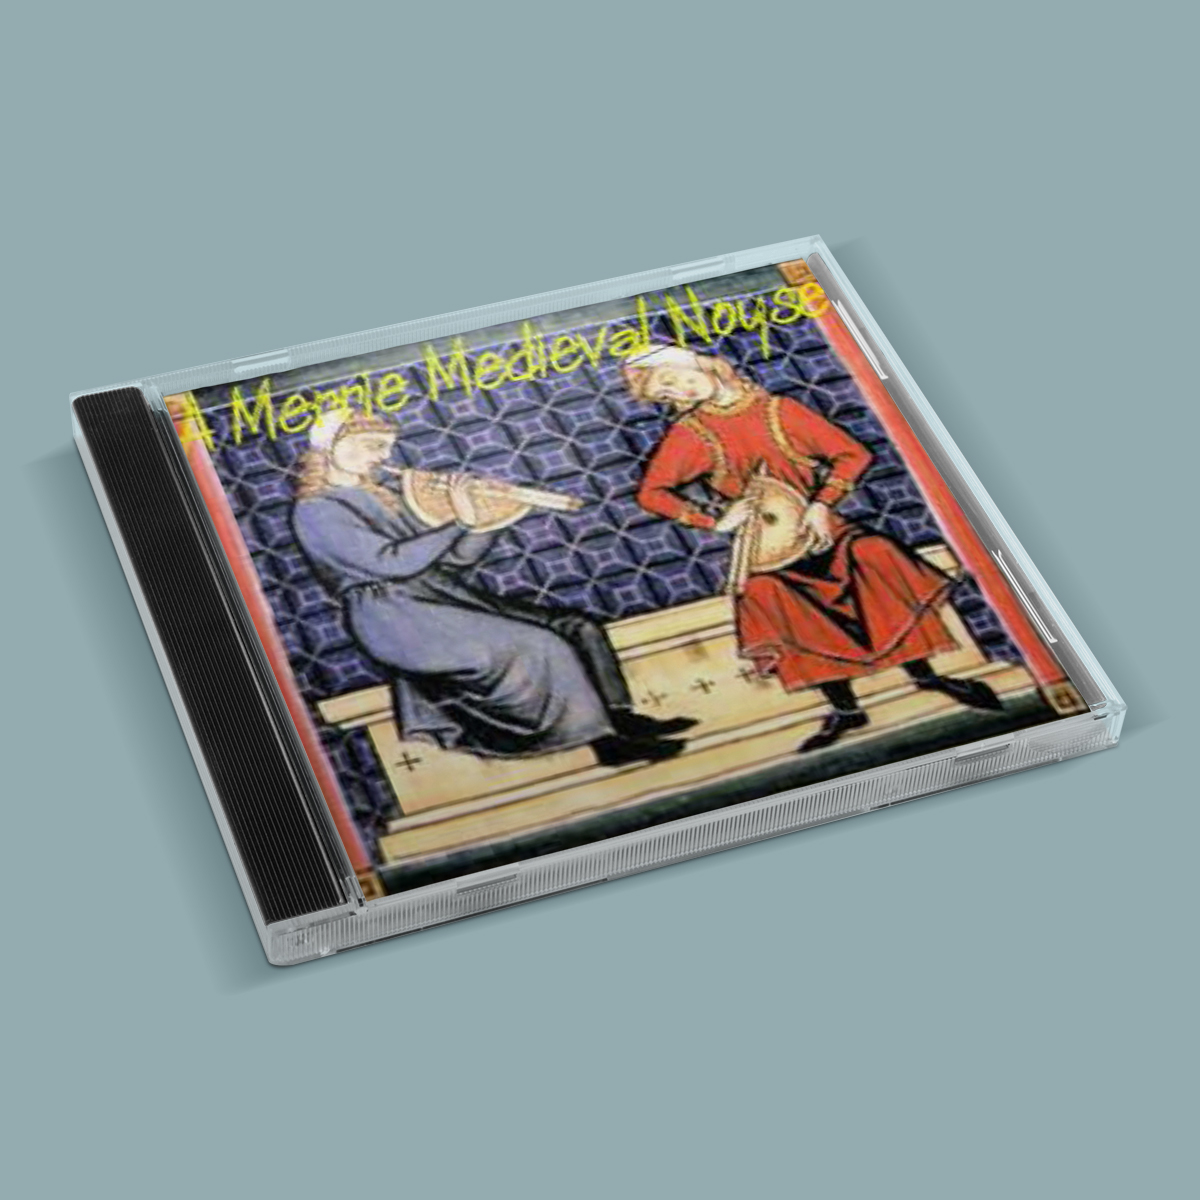 A Merrie Medieval Noyse CD